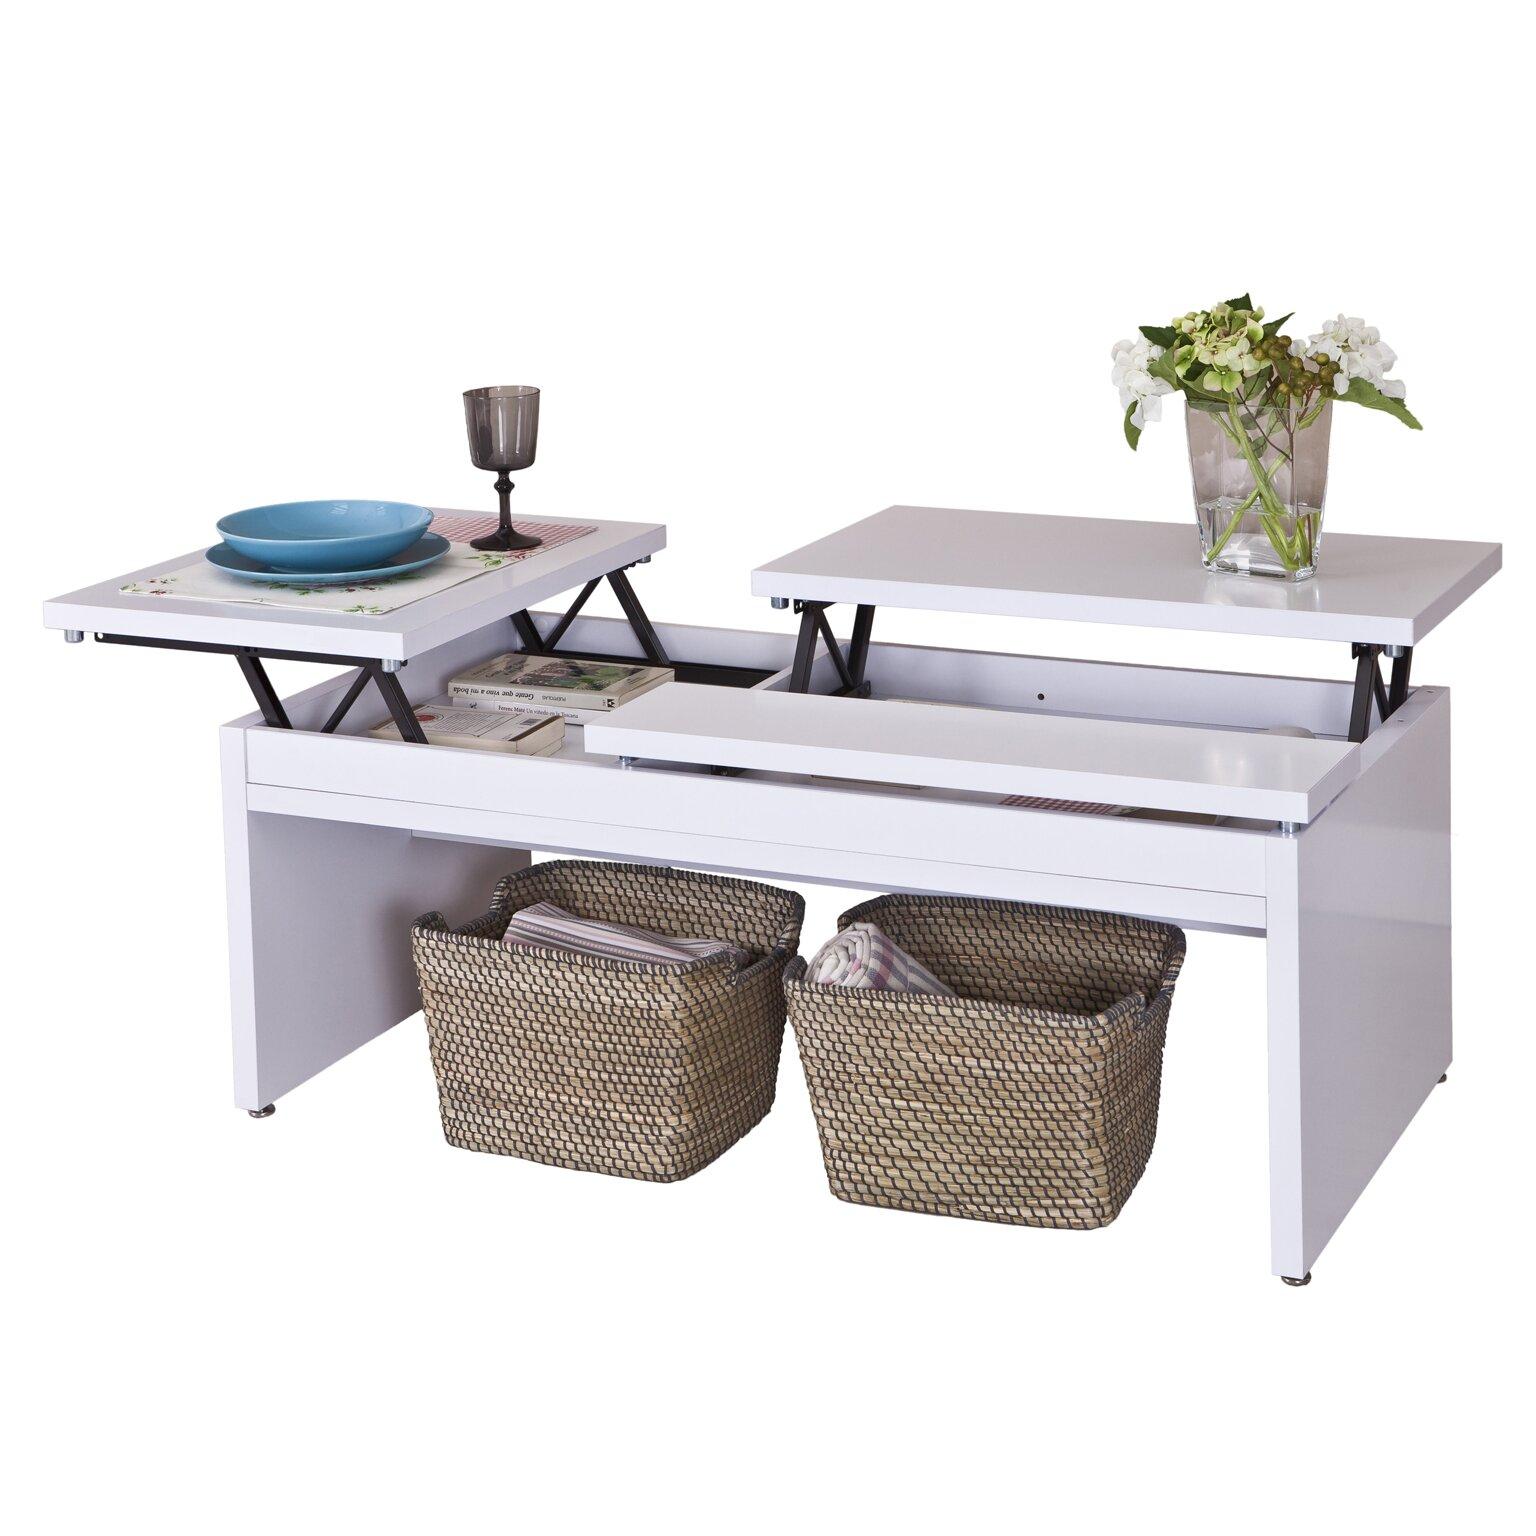 Wayfair Uk Glass Coffee Table: Hokku Designs Cortland Coffee Table